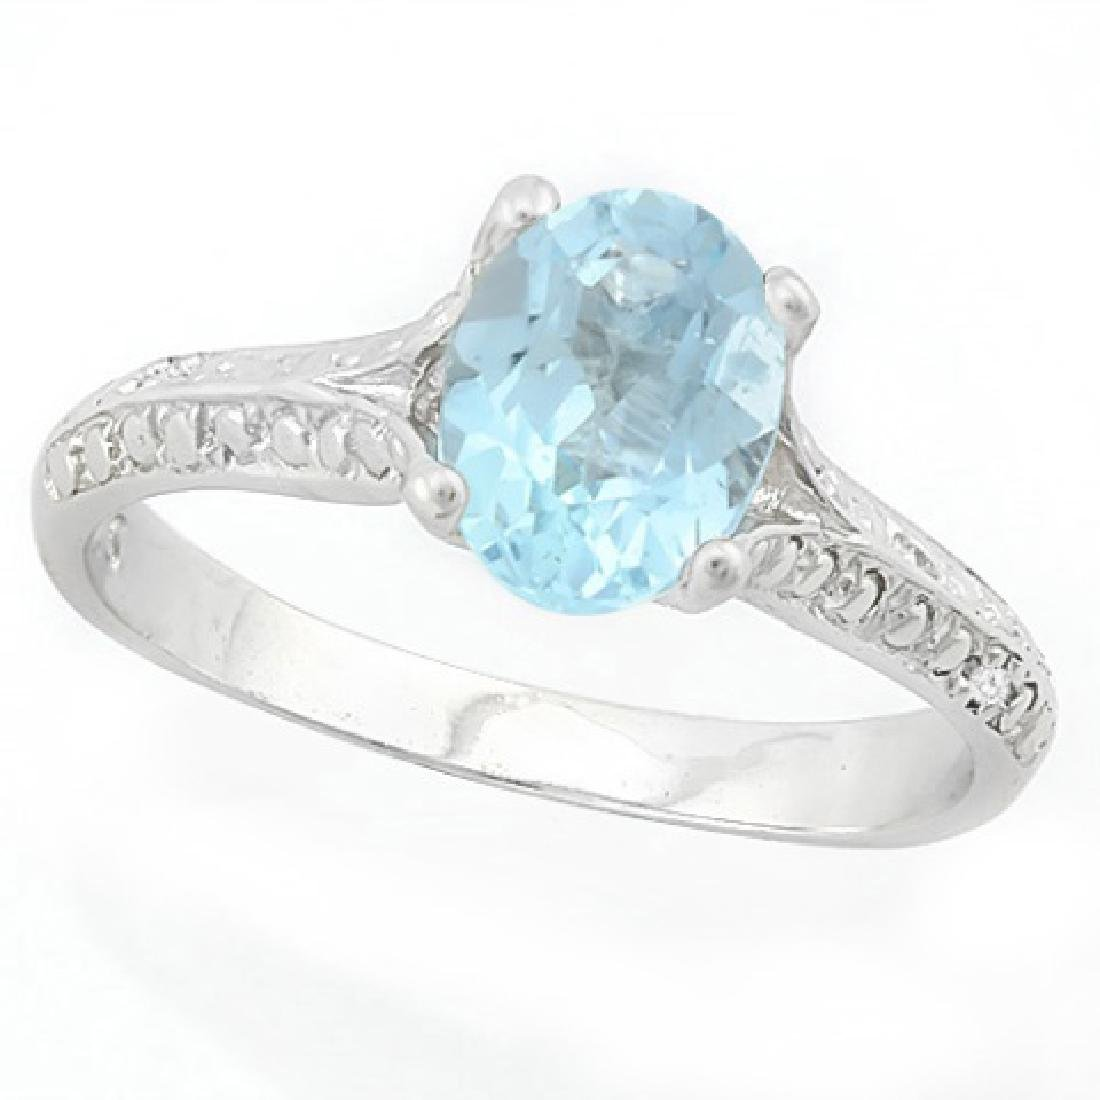 ELEGANT 1CT SWISS BLUE TOPAZ SOLITAIRE RING